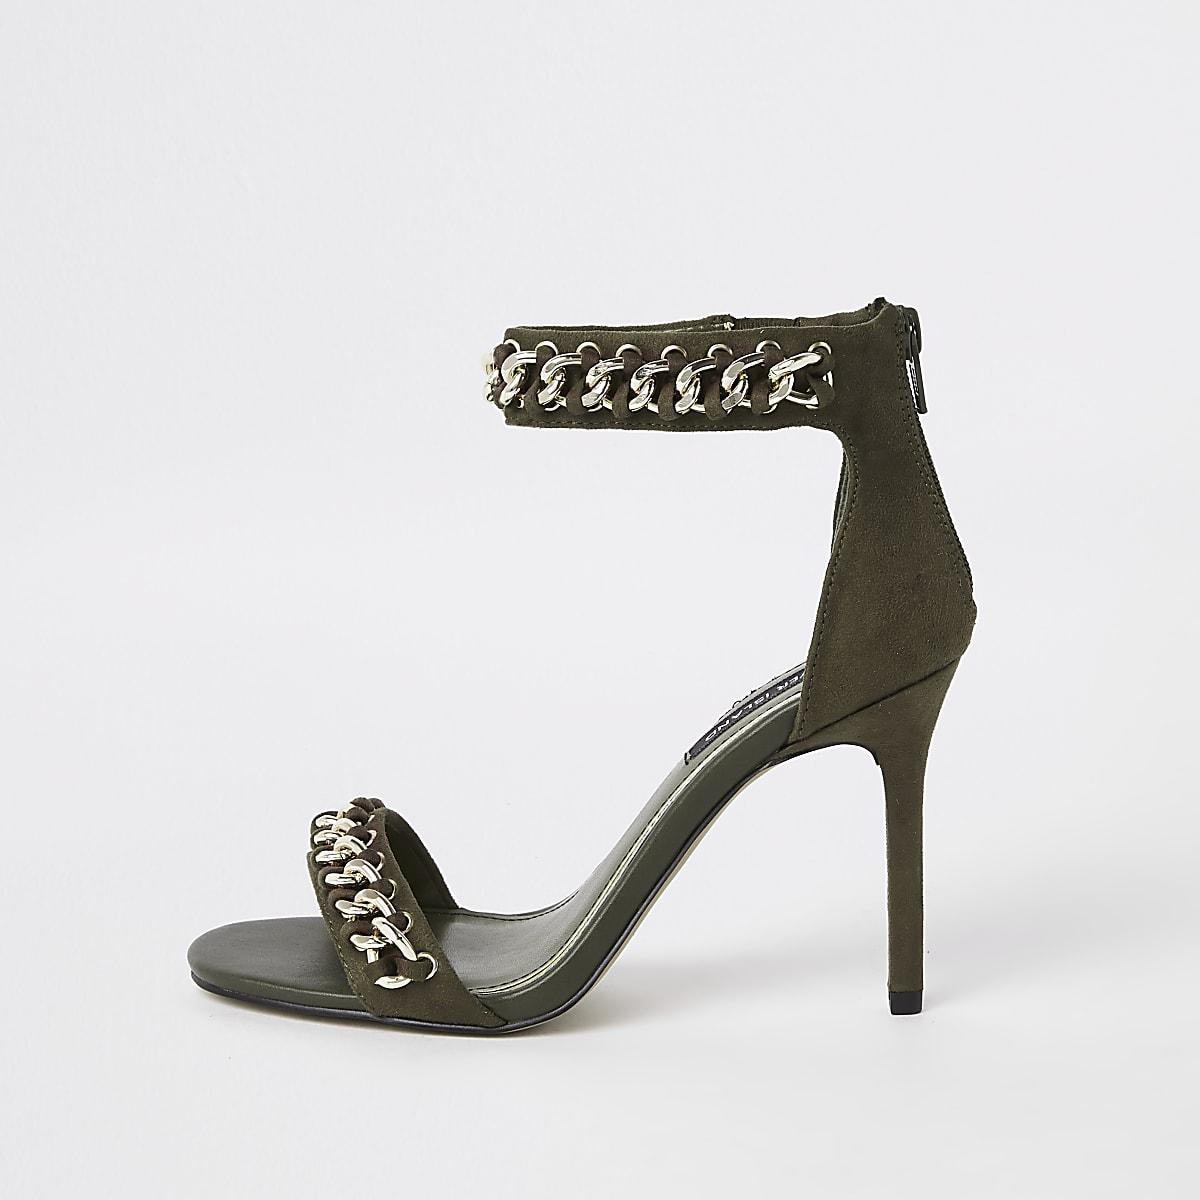 Kaki minimalistische sandalen met ketting